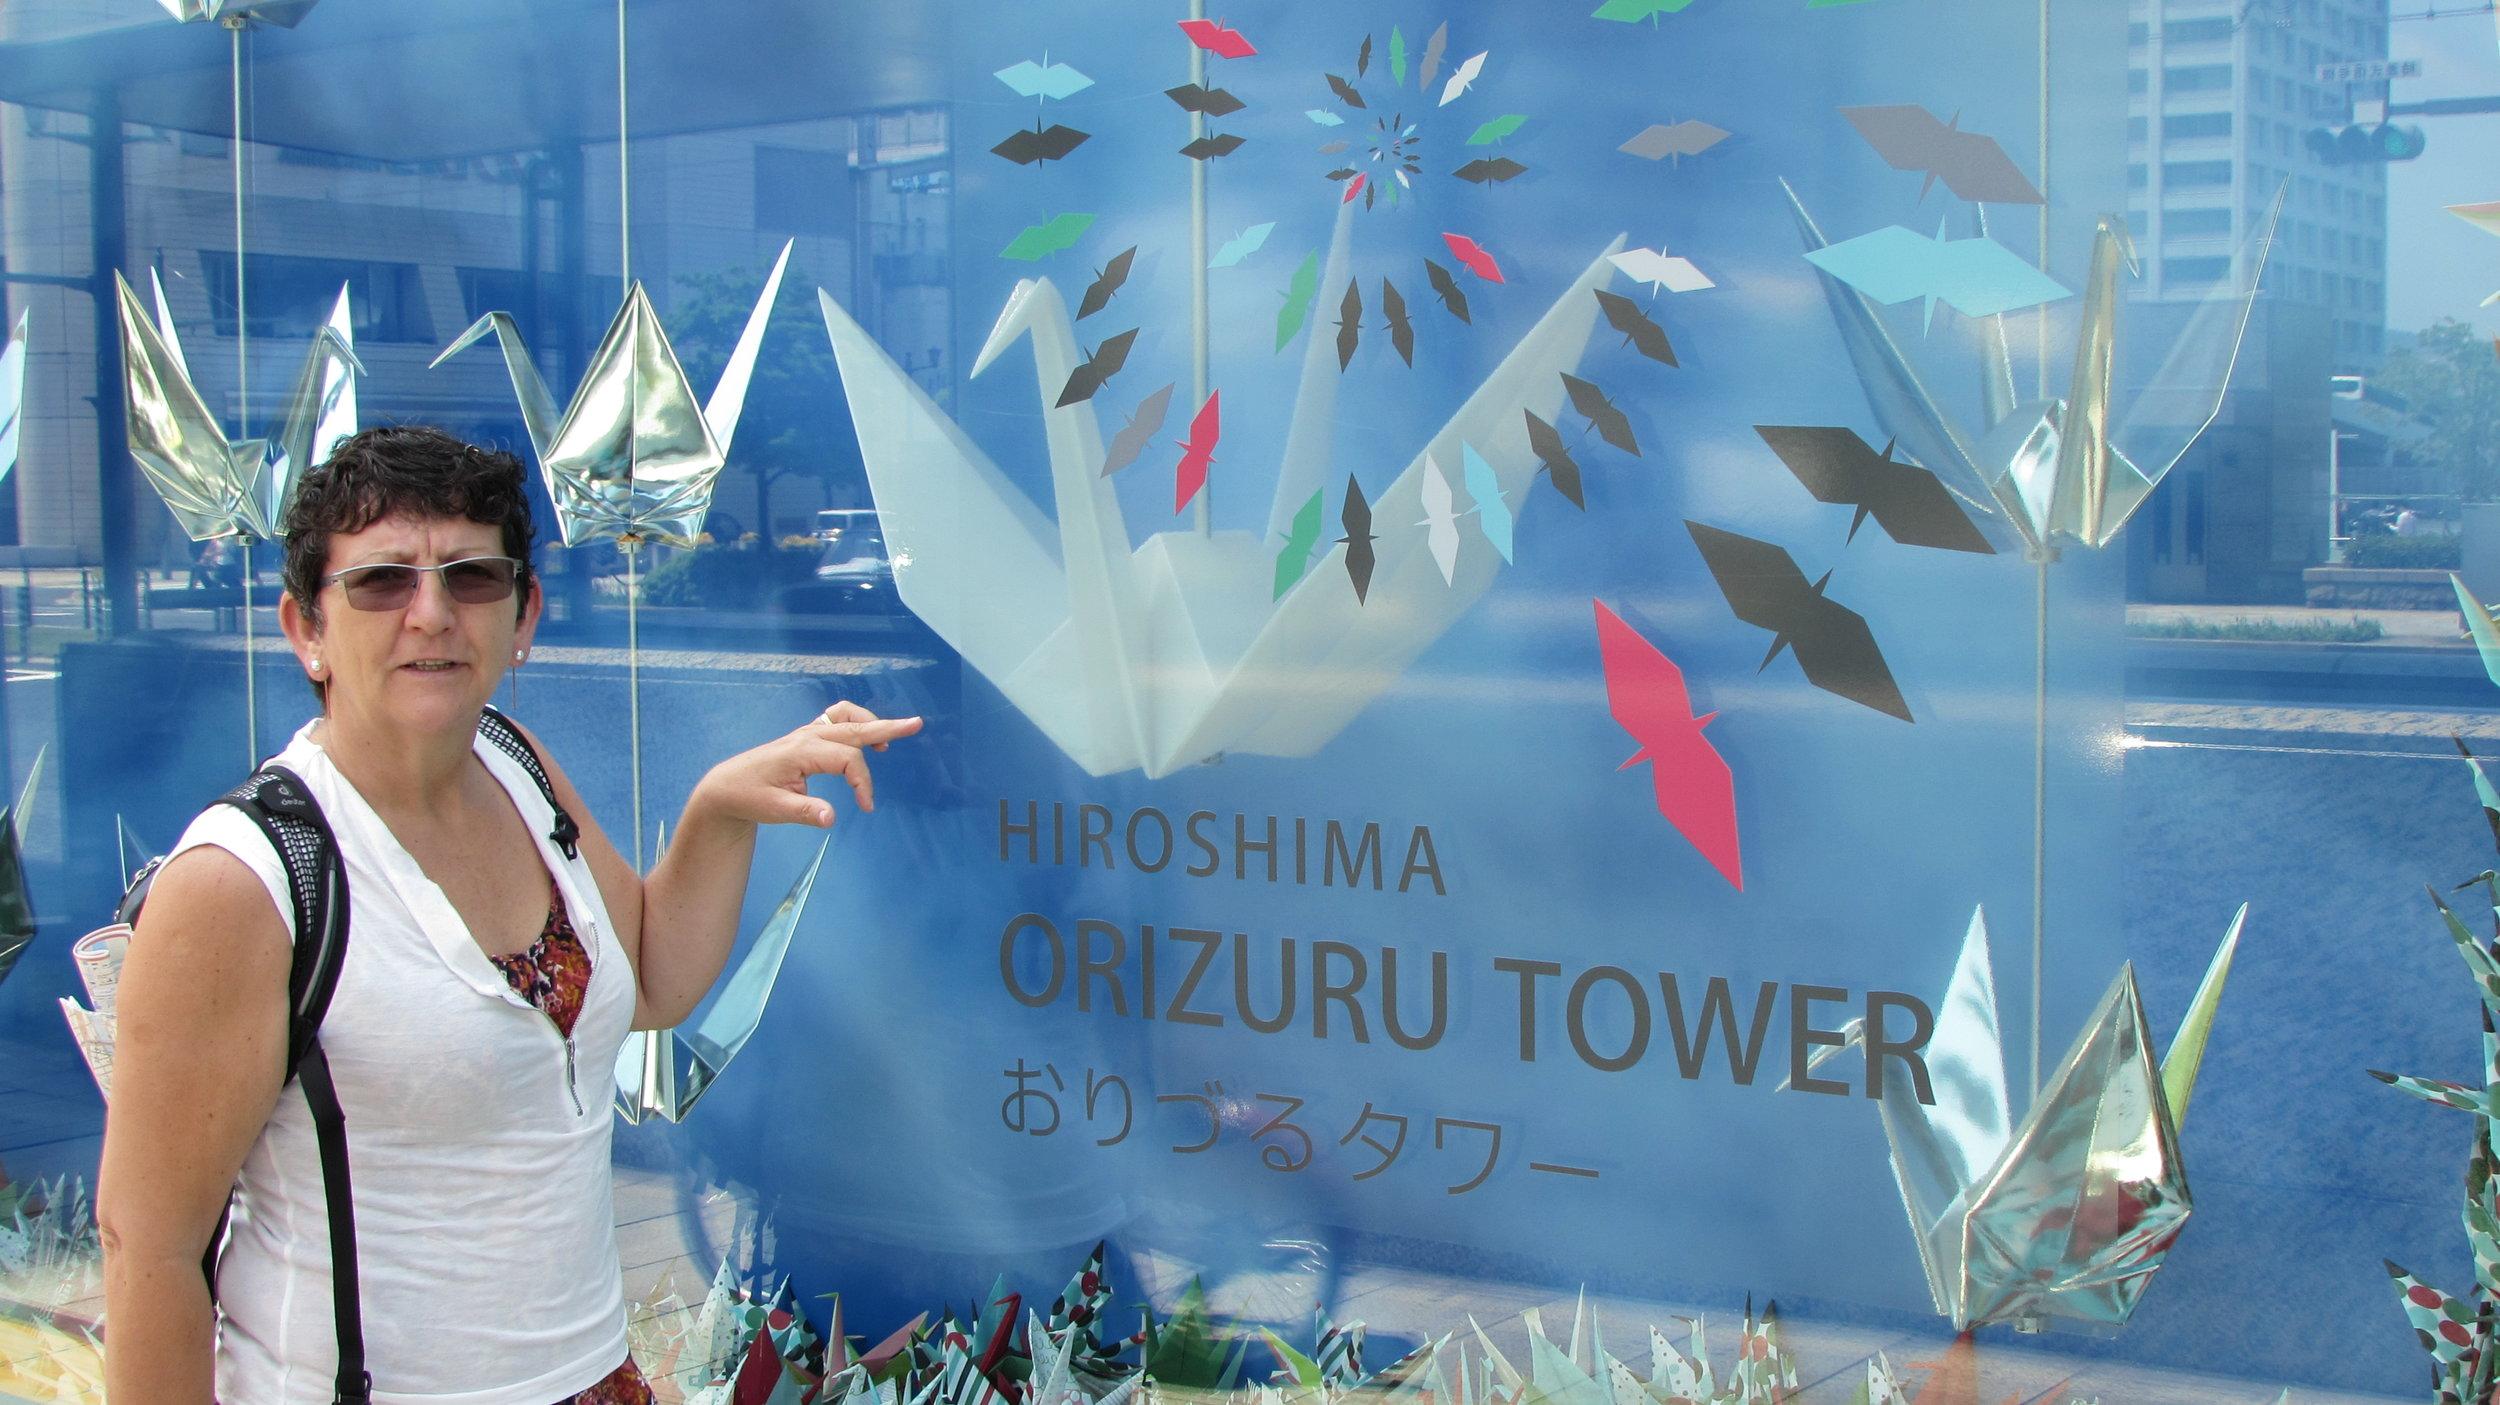 Origami birds symbolizing peace